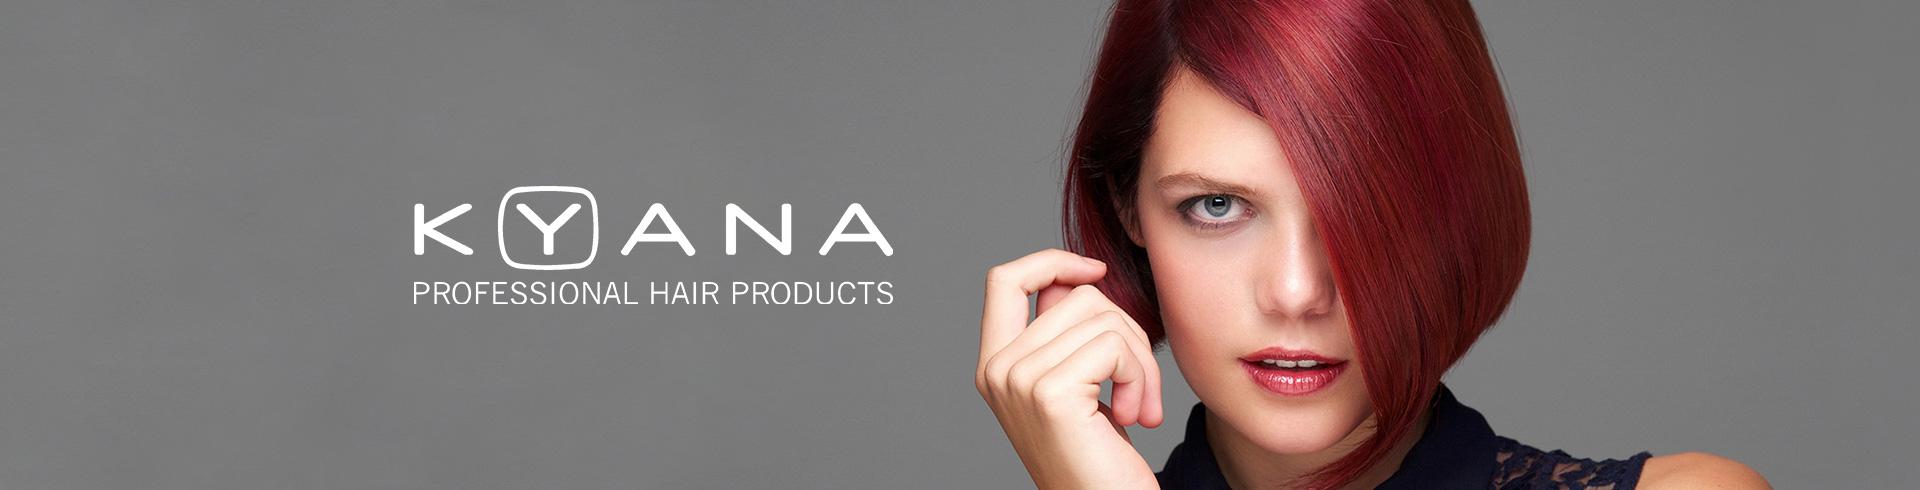 KYANA προϊόντα περιποίησης μαλλιών Le Tif